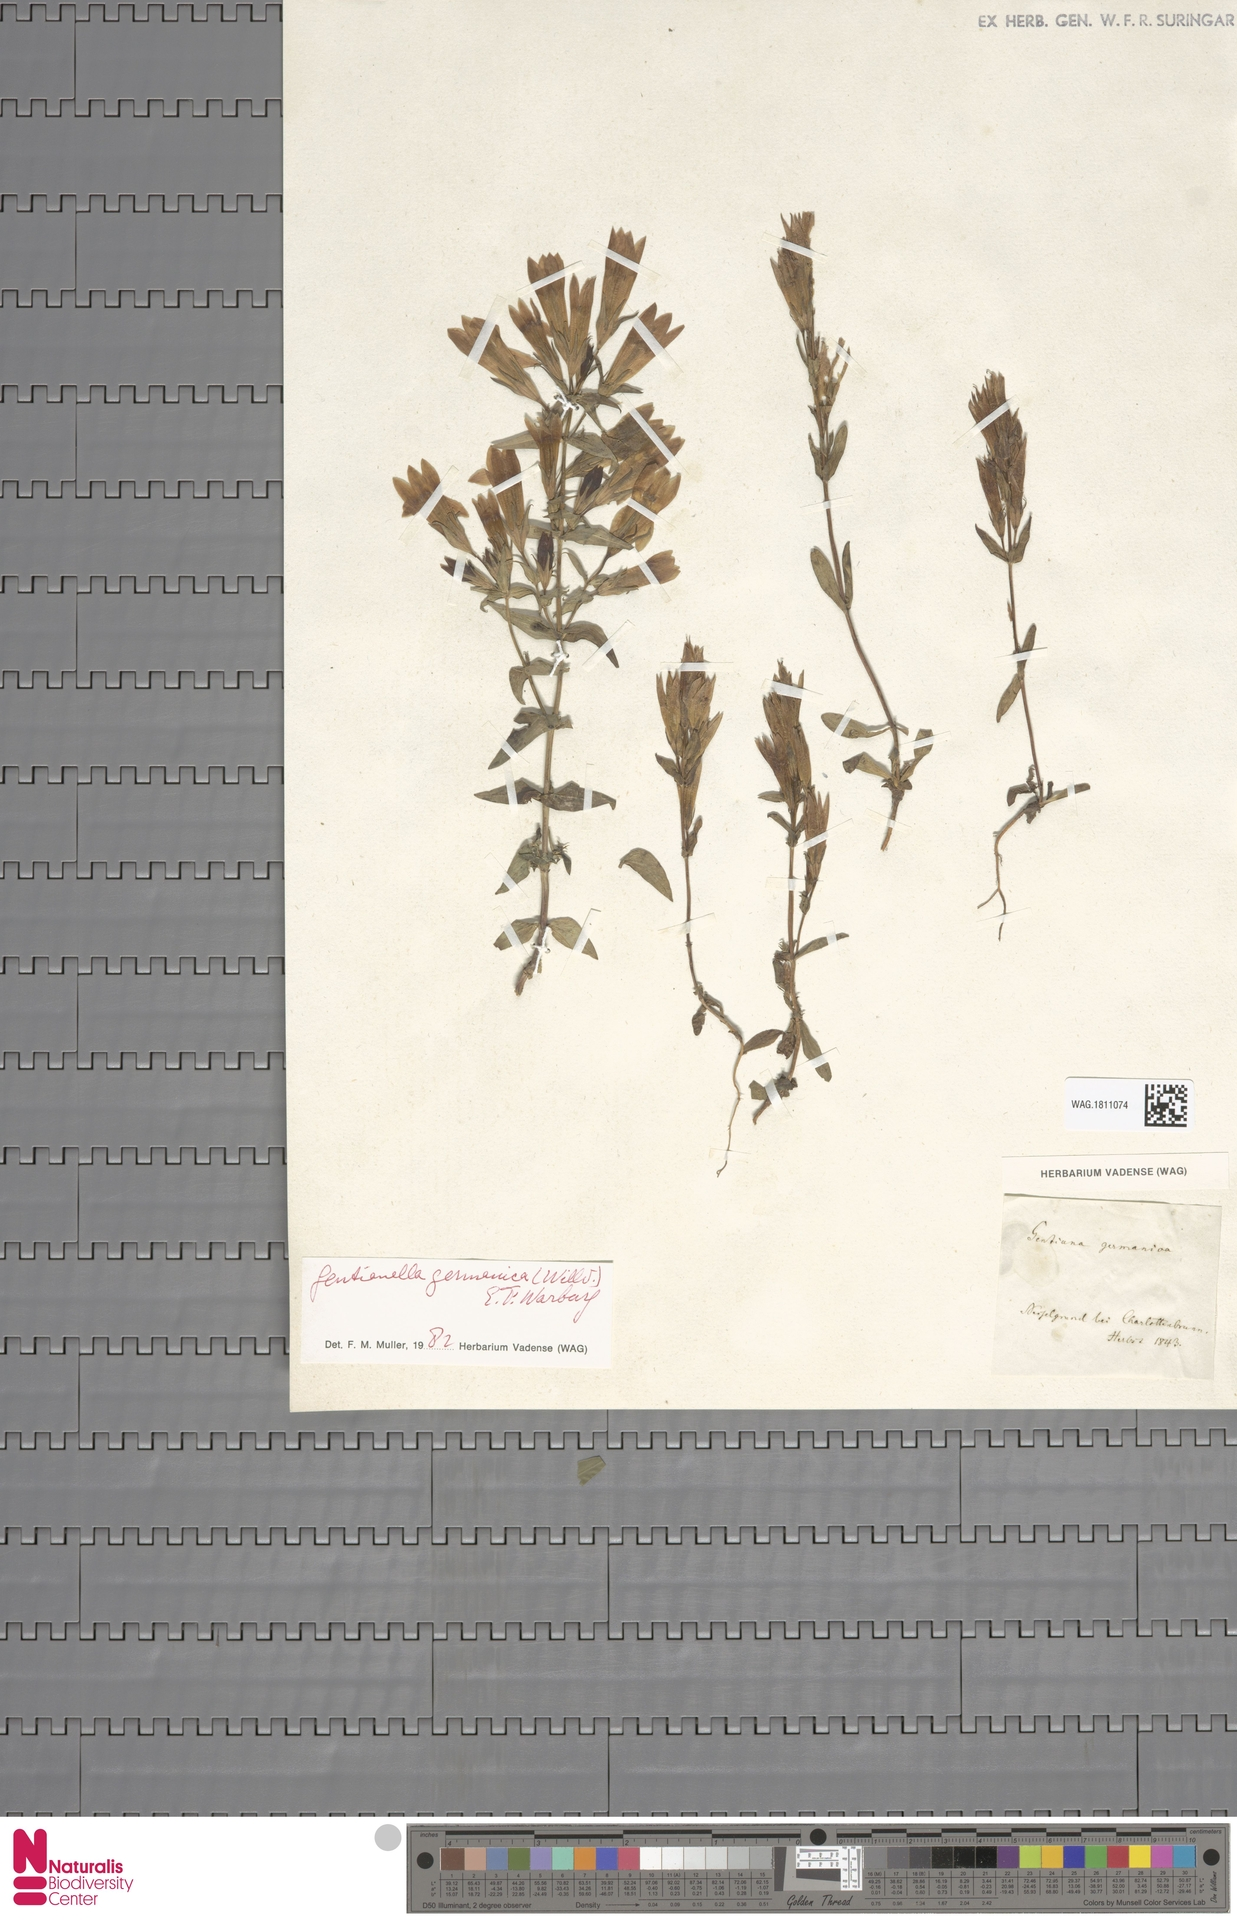 WAG.1811074 | Gentianella germanica (Willd.) E.F.Warb.